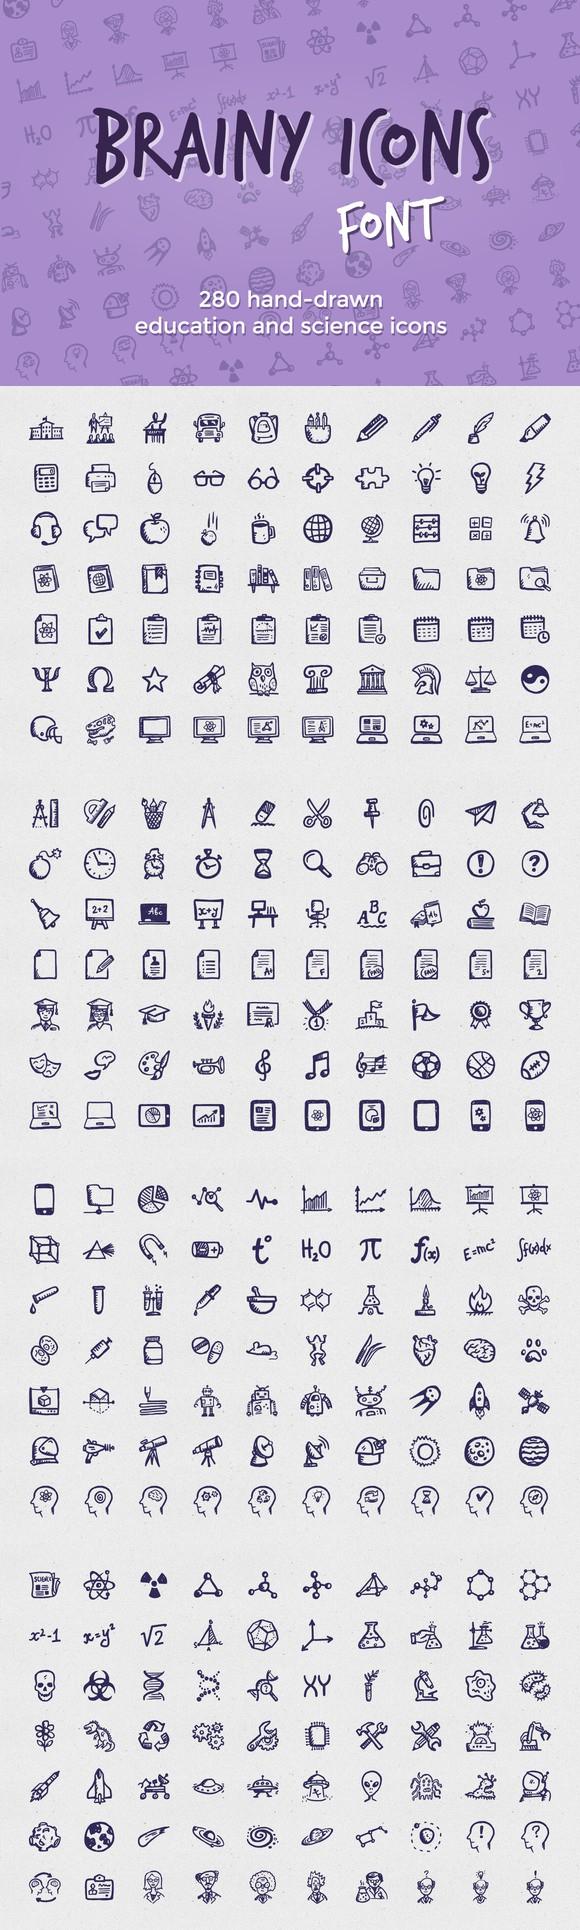 Brainy Icons Font Symbol Fonts 2500 Symbol Fonts Pinterest